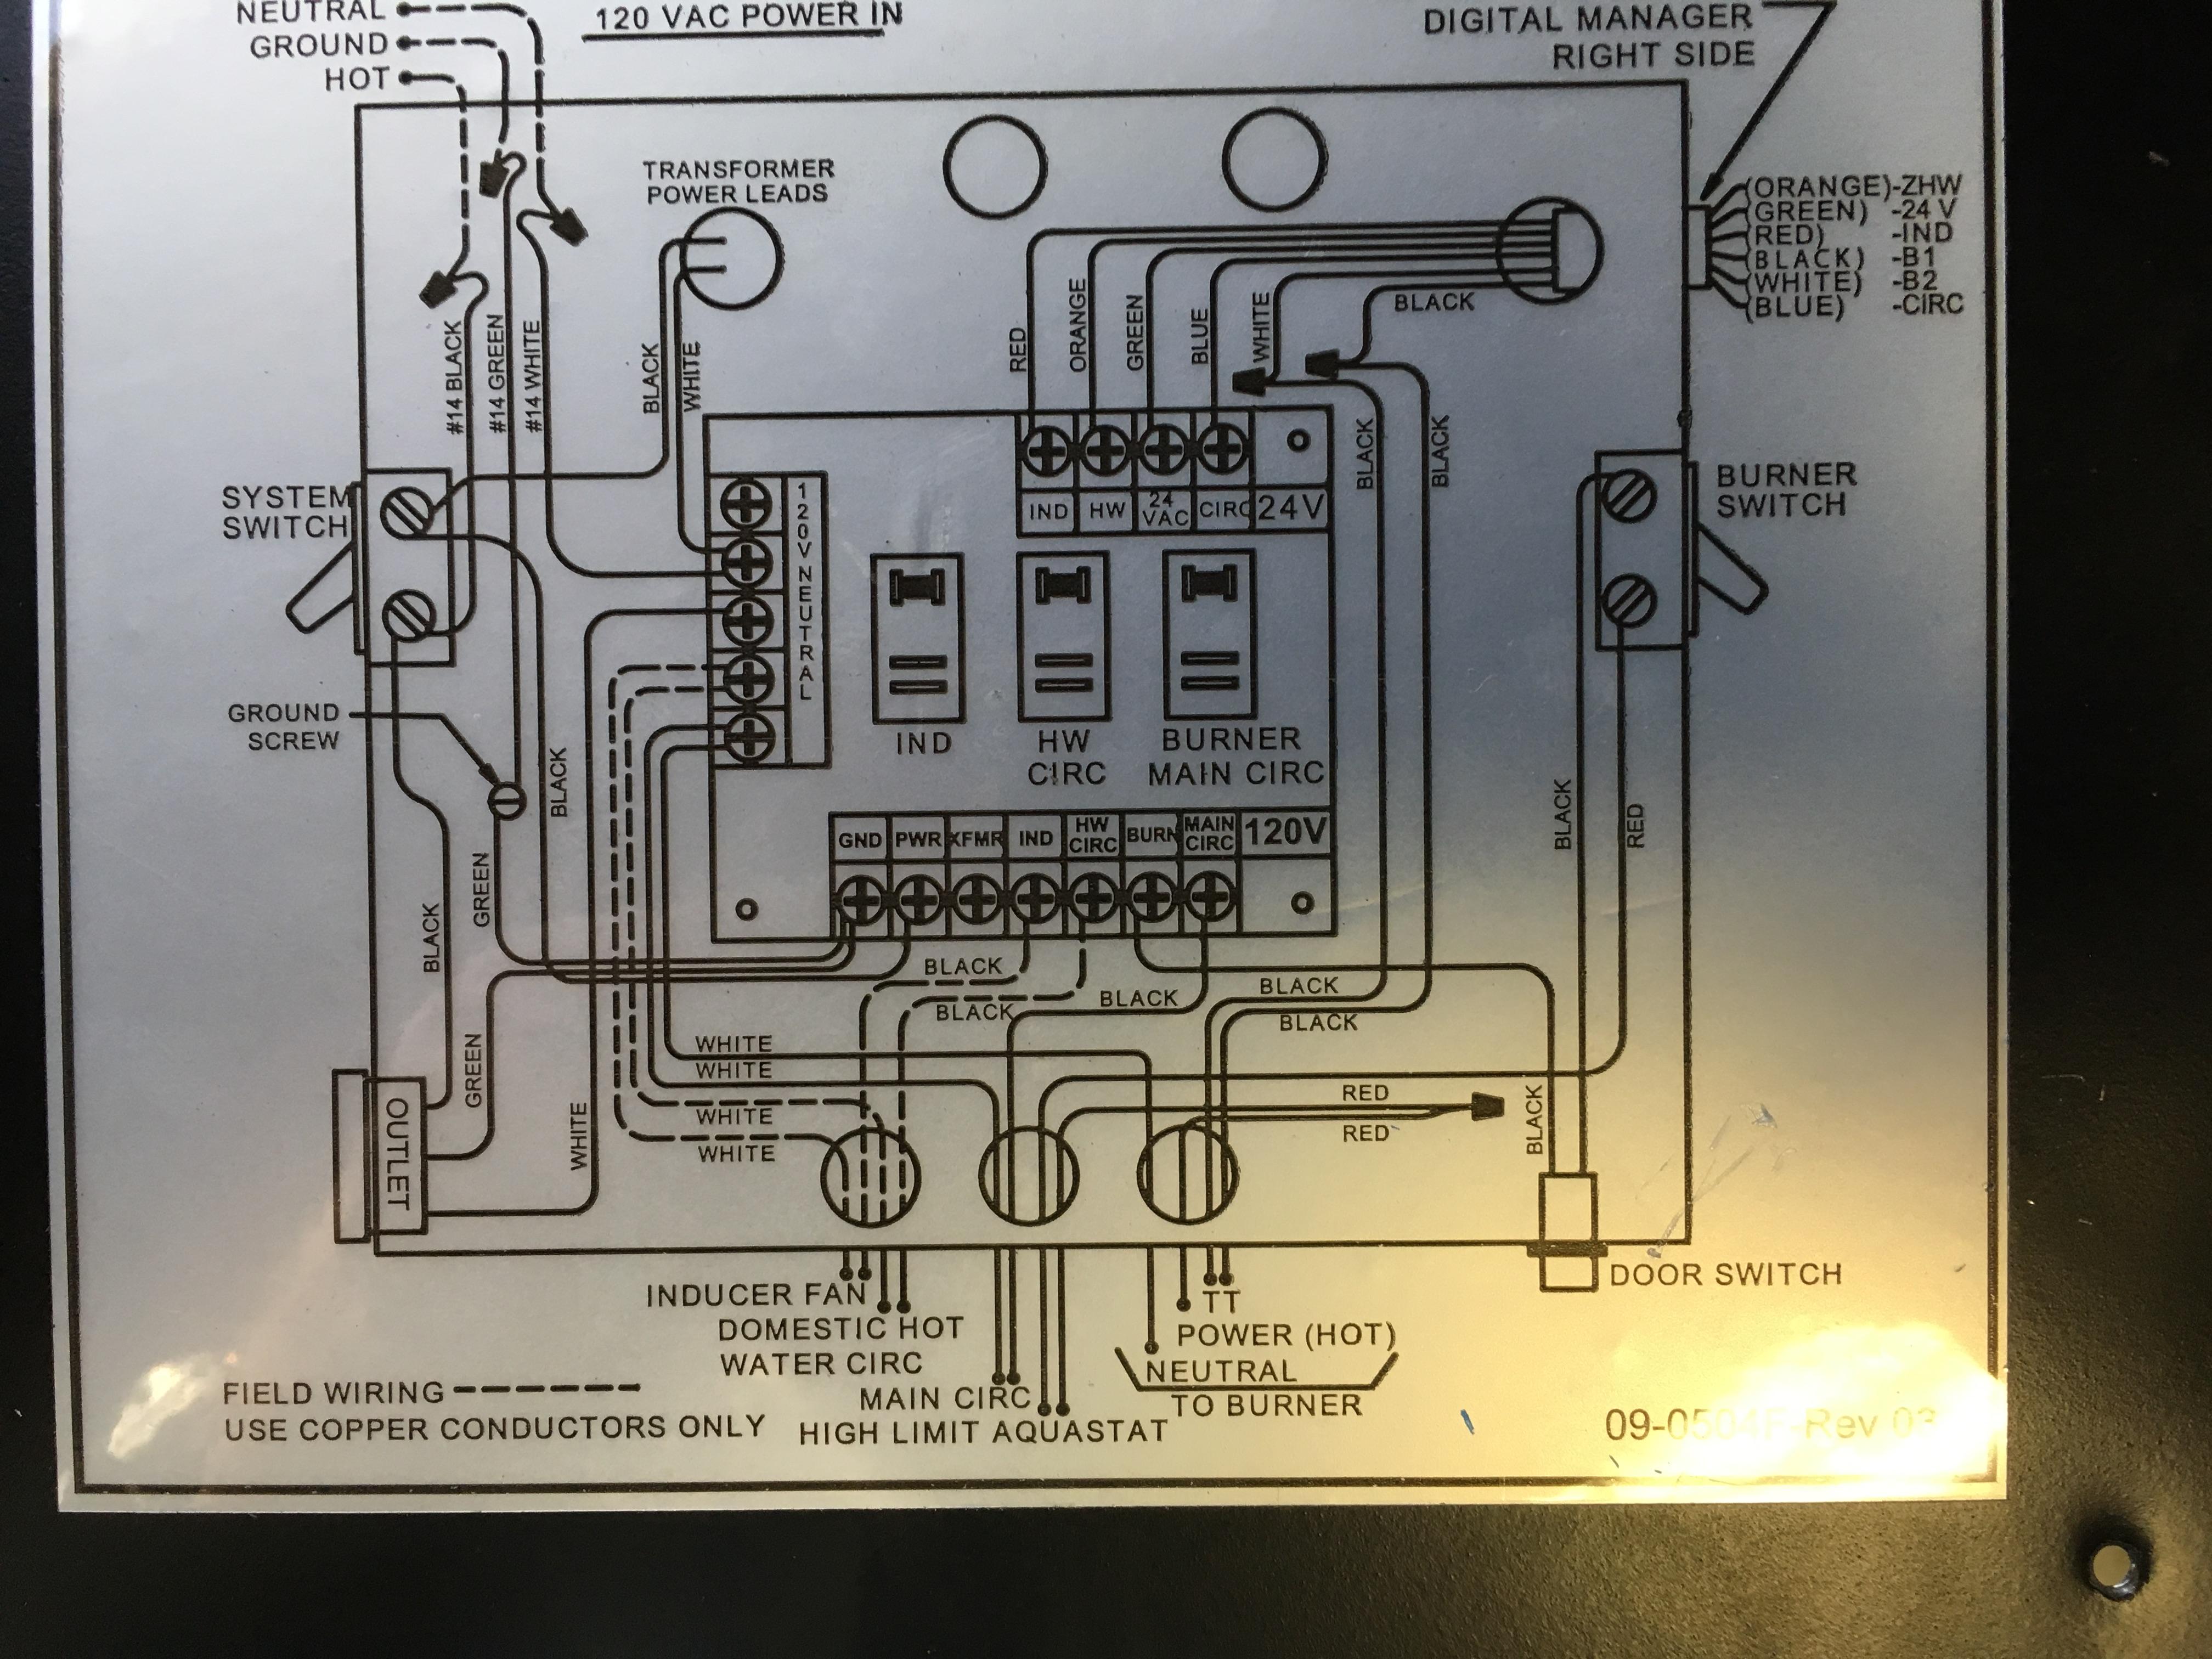 power vent motor runs too long \u2014 heating help the wall Single Line Wiring Diagram